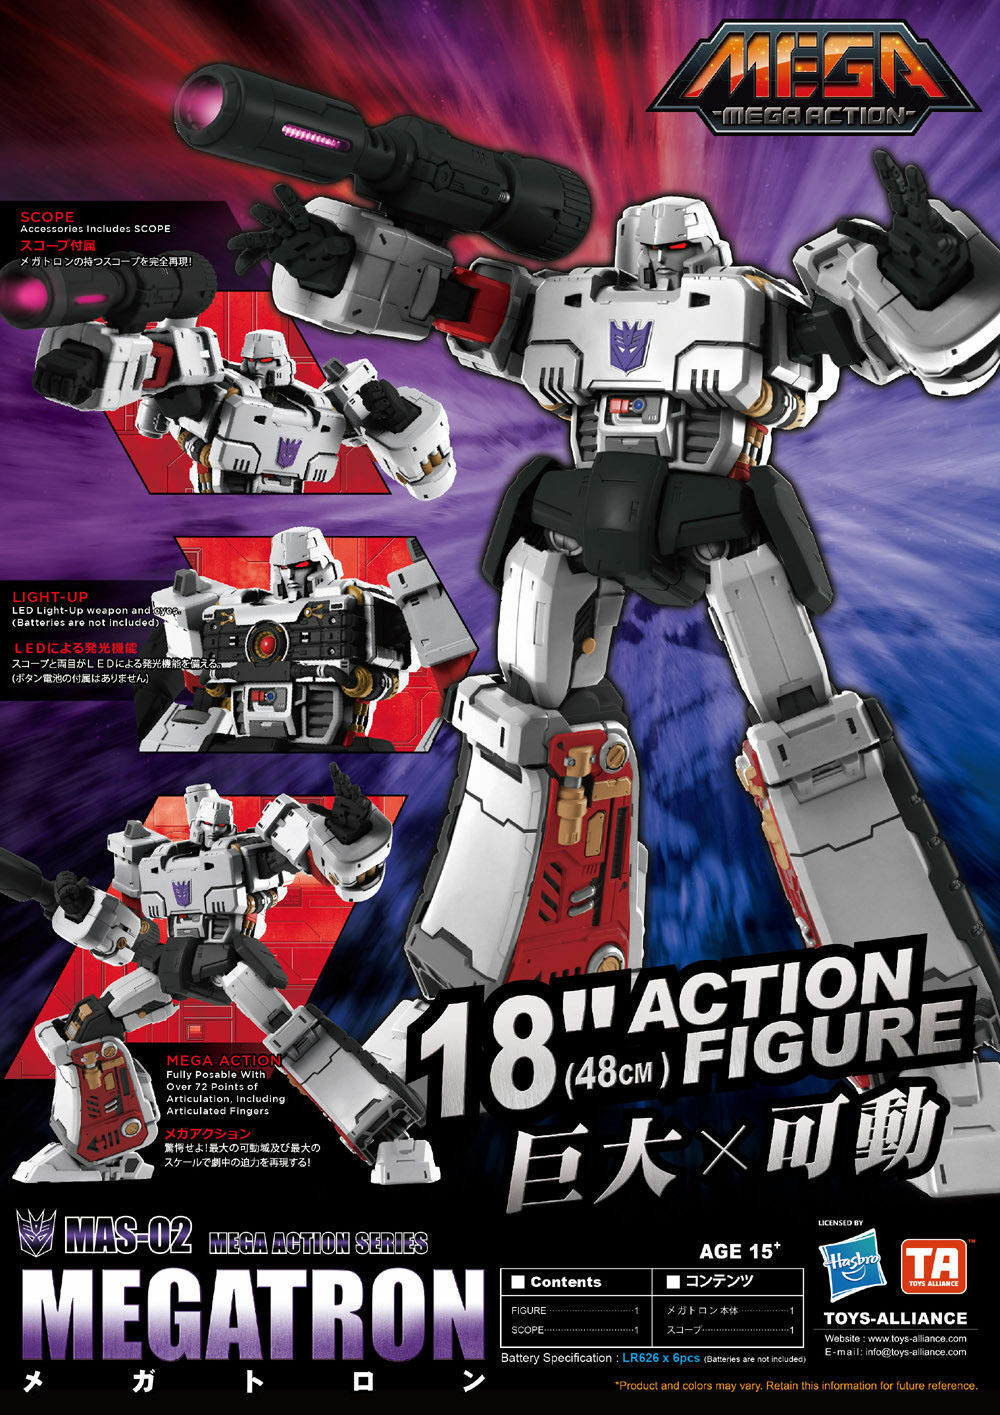 Roboter transformers megatron spielzeug allianz mega - aktion mas-02 decepticon - 50 cm